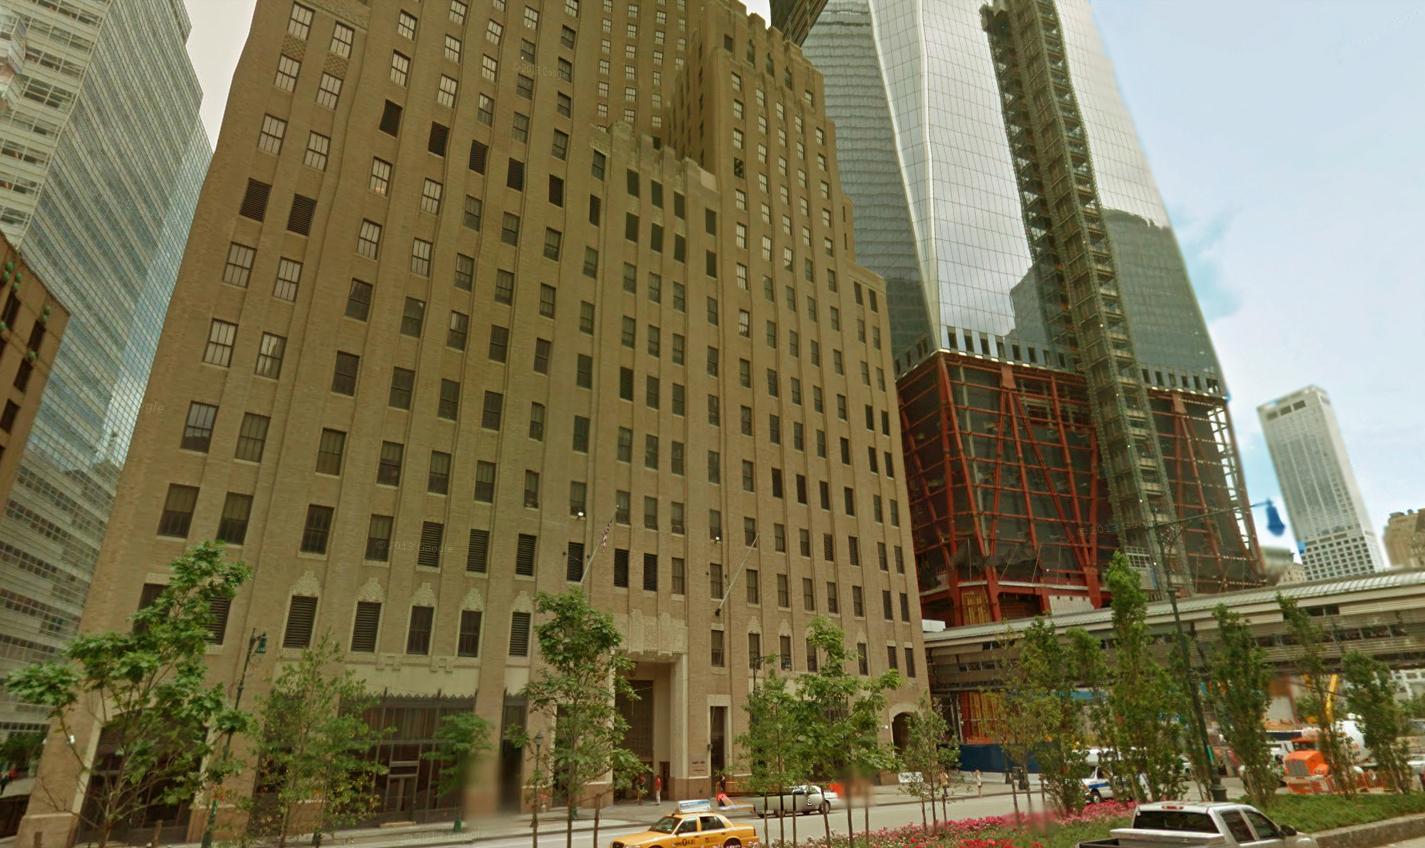 Verizon building 140 West Street